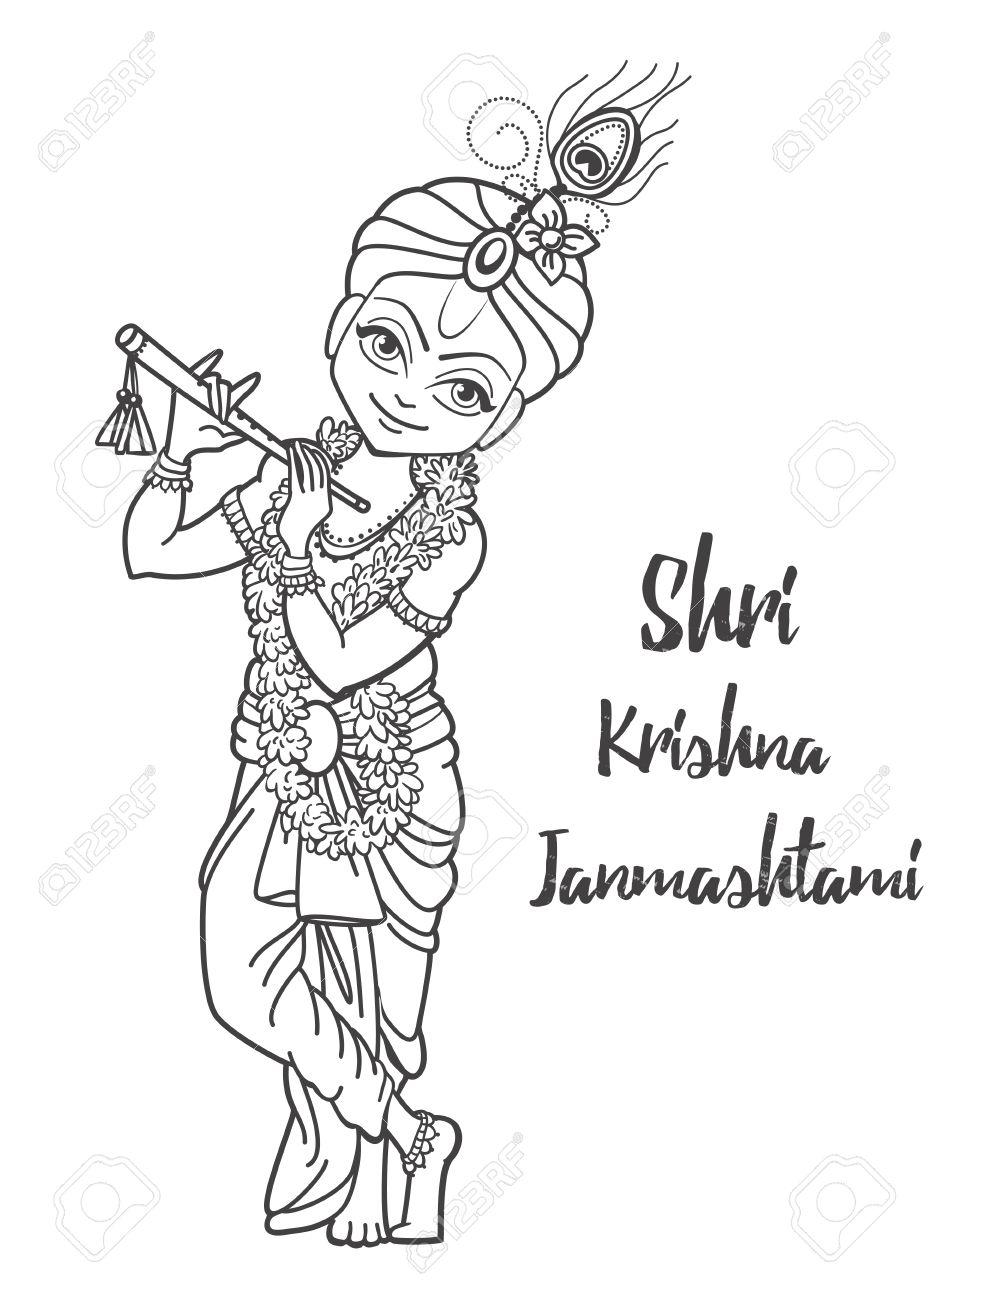 Ornament Card With Lord Shri Krishna Birthday Illustration In